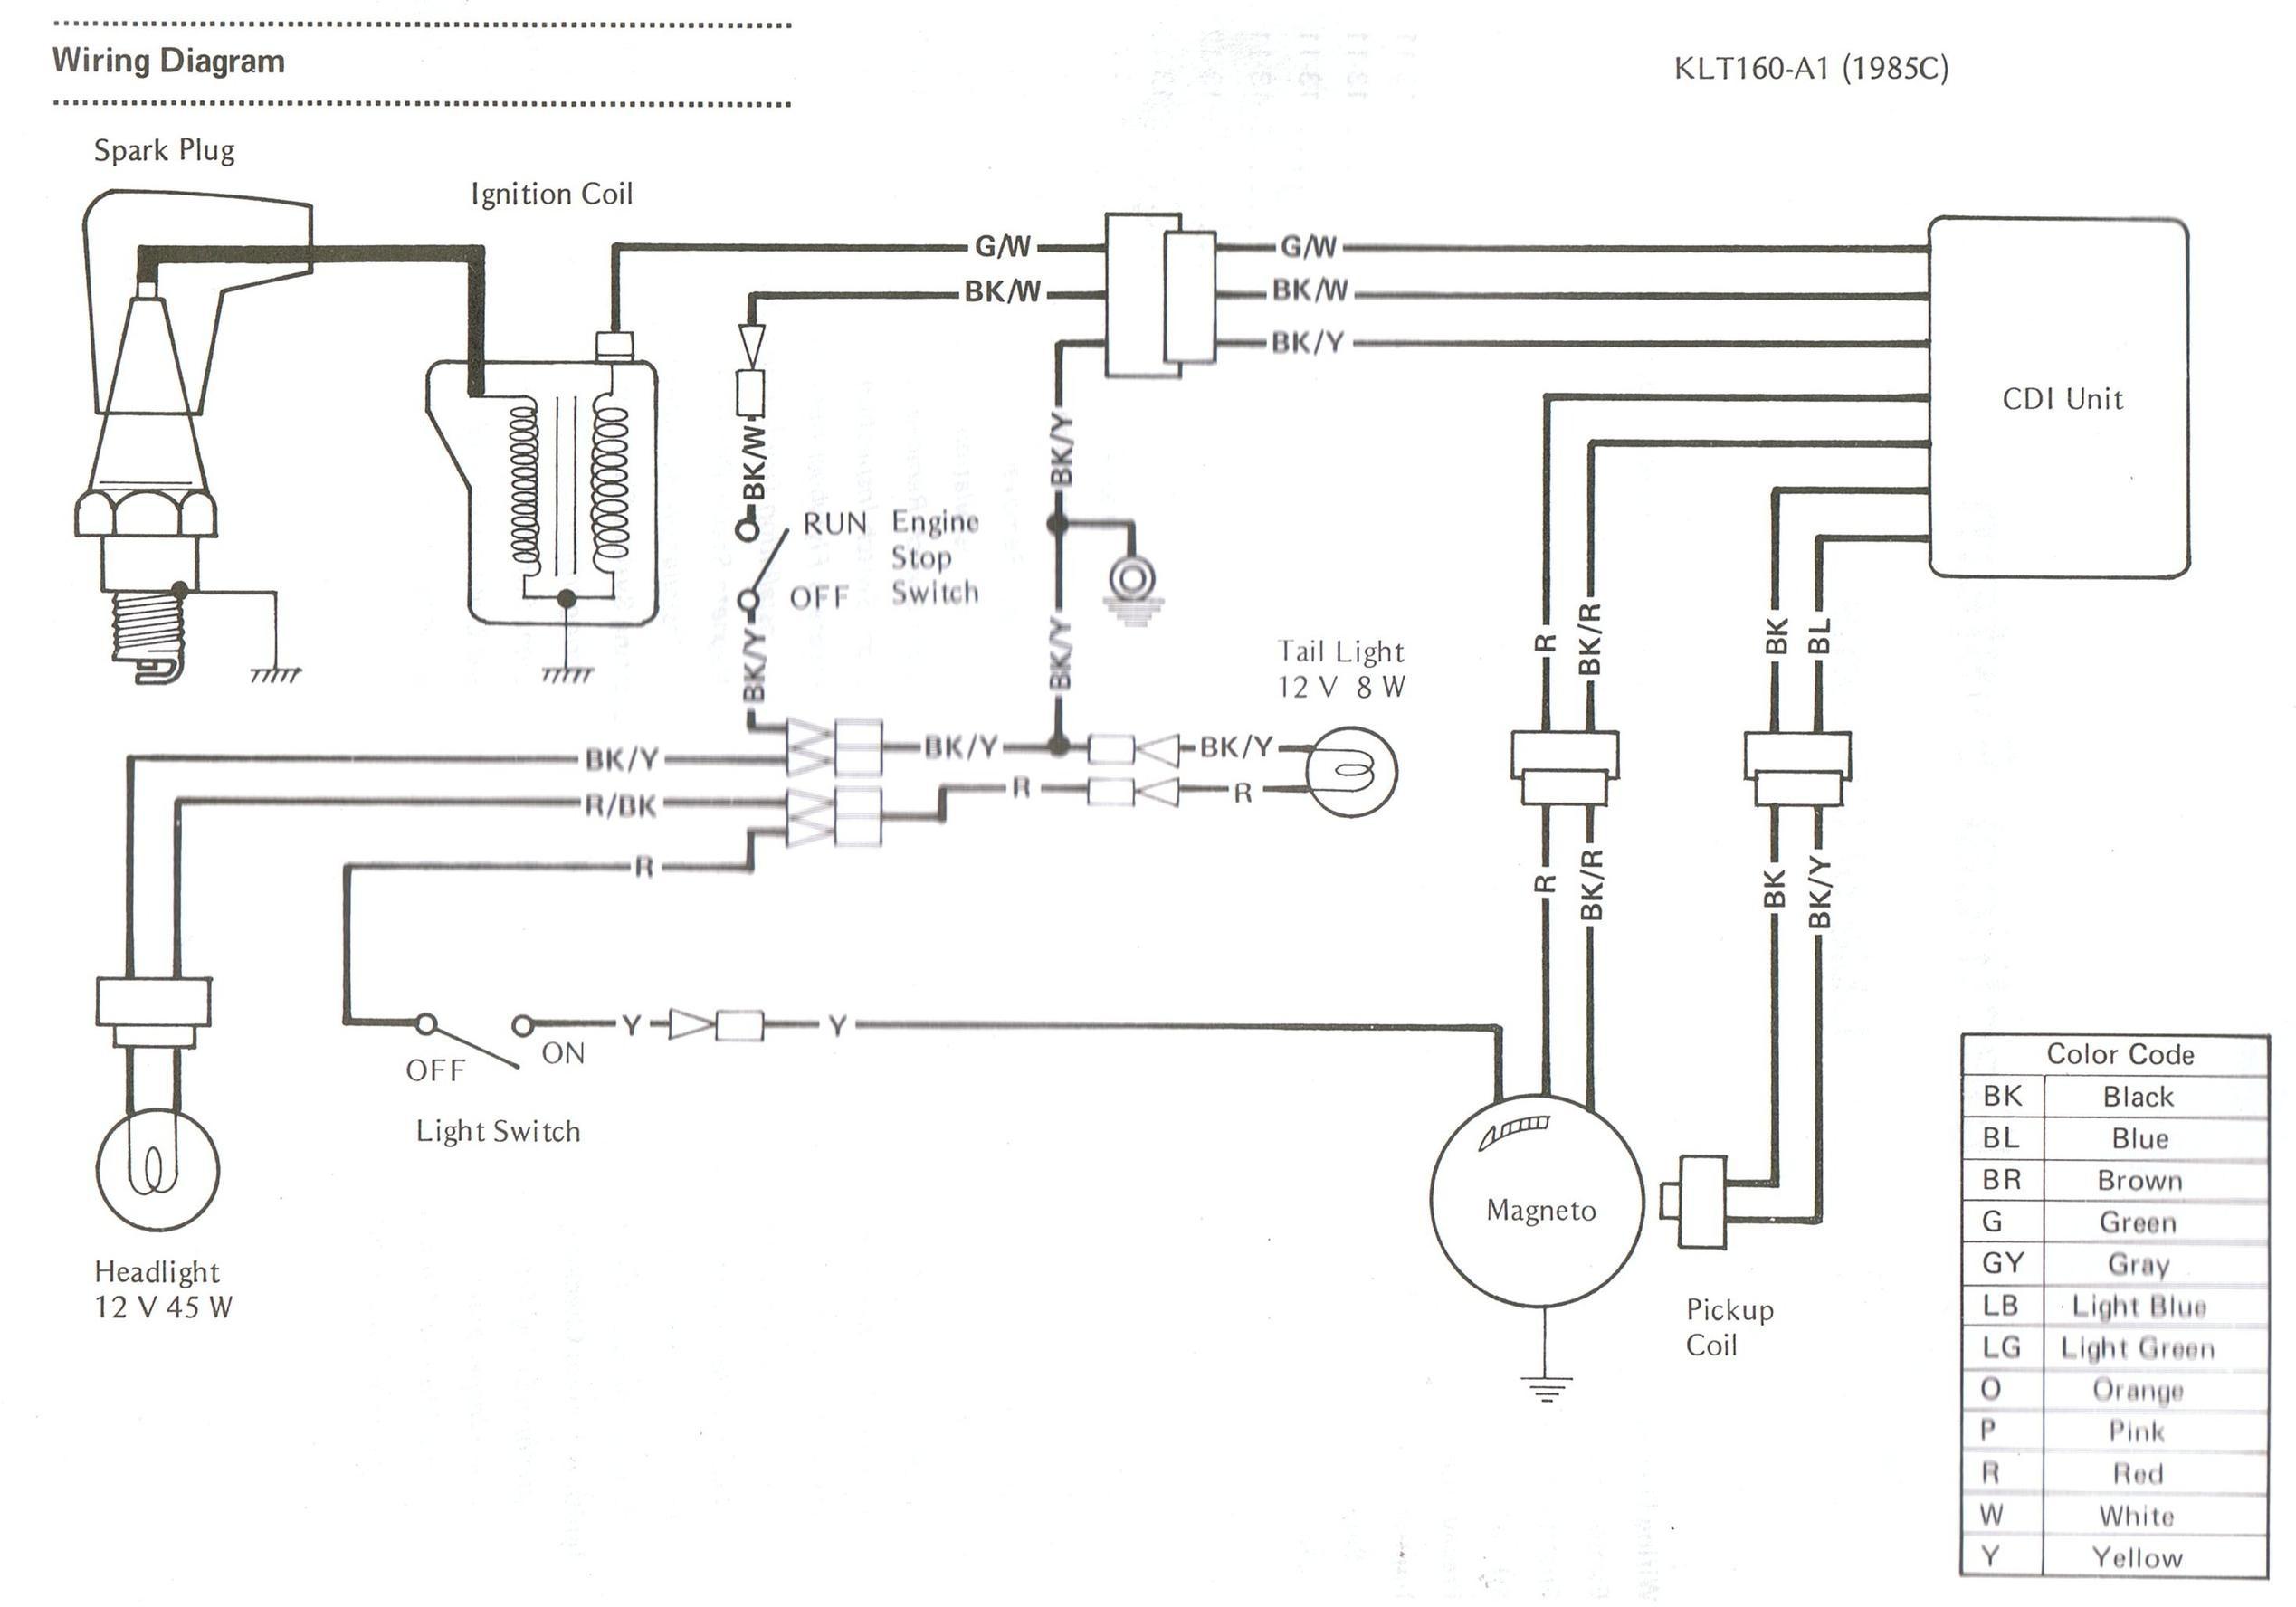 Alfa Romeo 33 Wiring Diagram Trusted Diagrams Mini Cooper Front Seat Spider S3 Enthusiast U2022 Transaxle